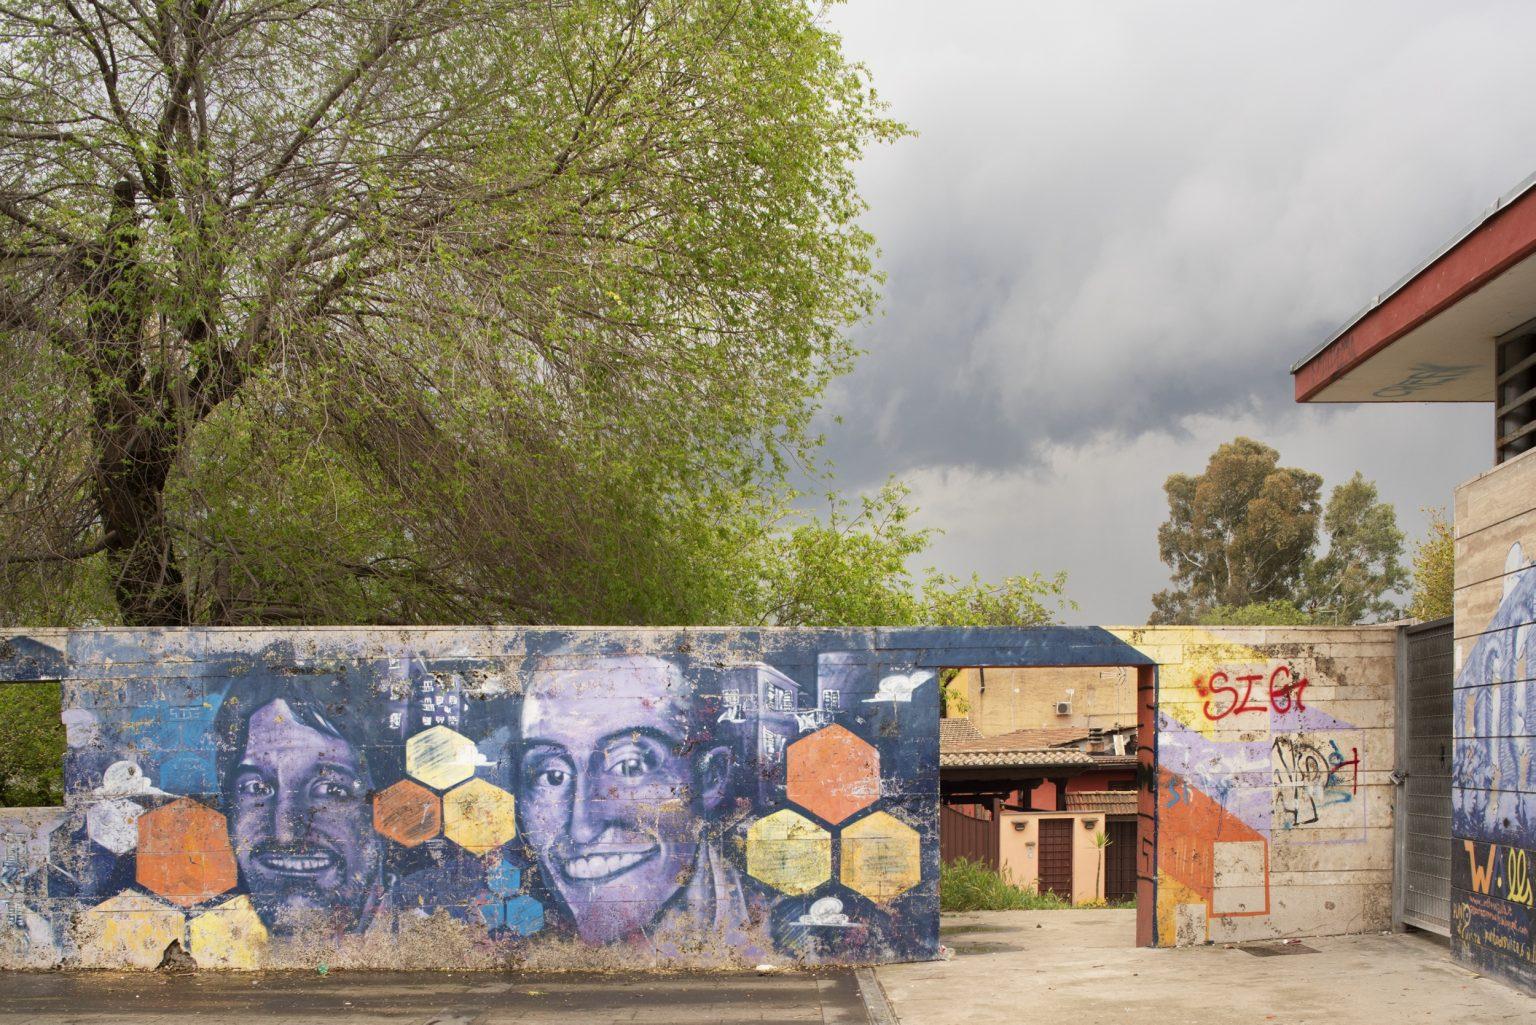 Rome, April 2017 - Parco Giordano Sangalli. Torpignattara district. >< Roma, aprile 2017 - Parco Giordano Sangalli. Quartiere Torpignattara.